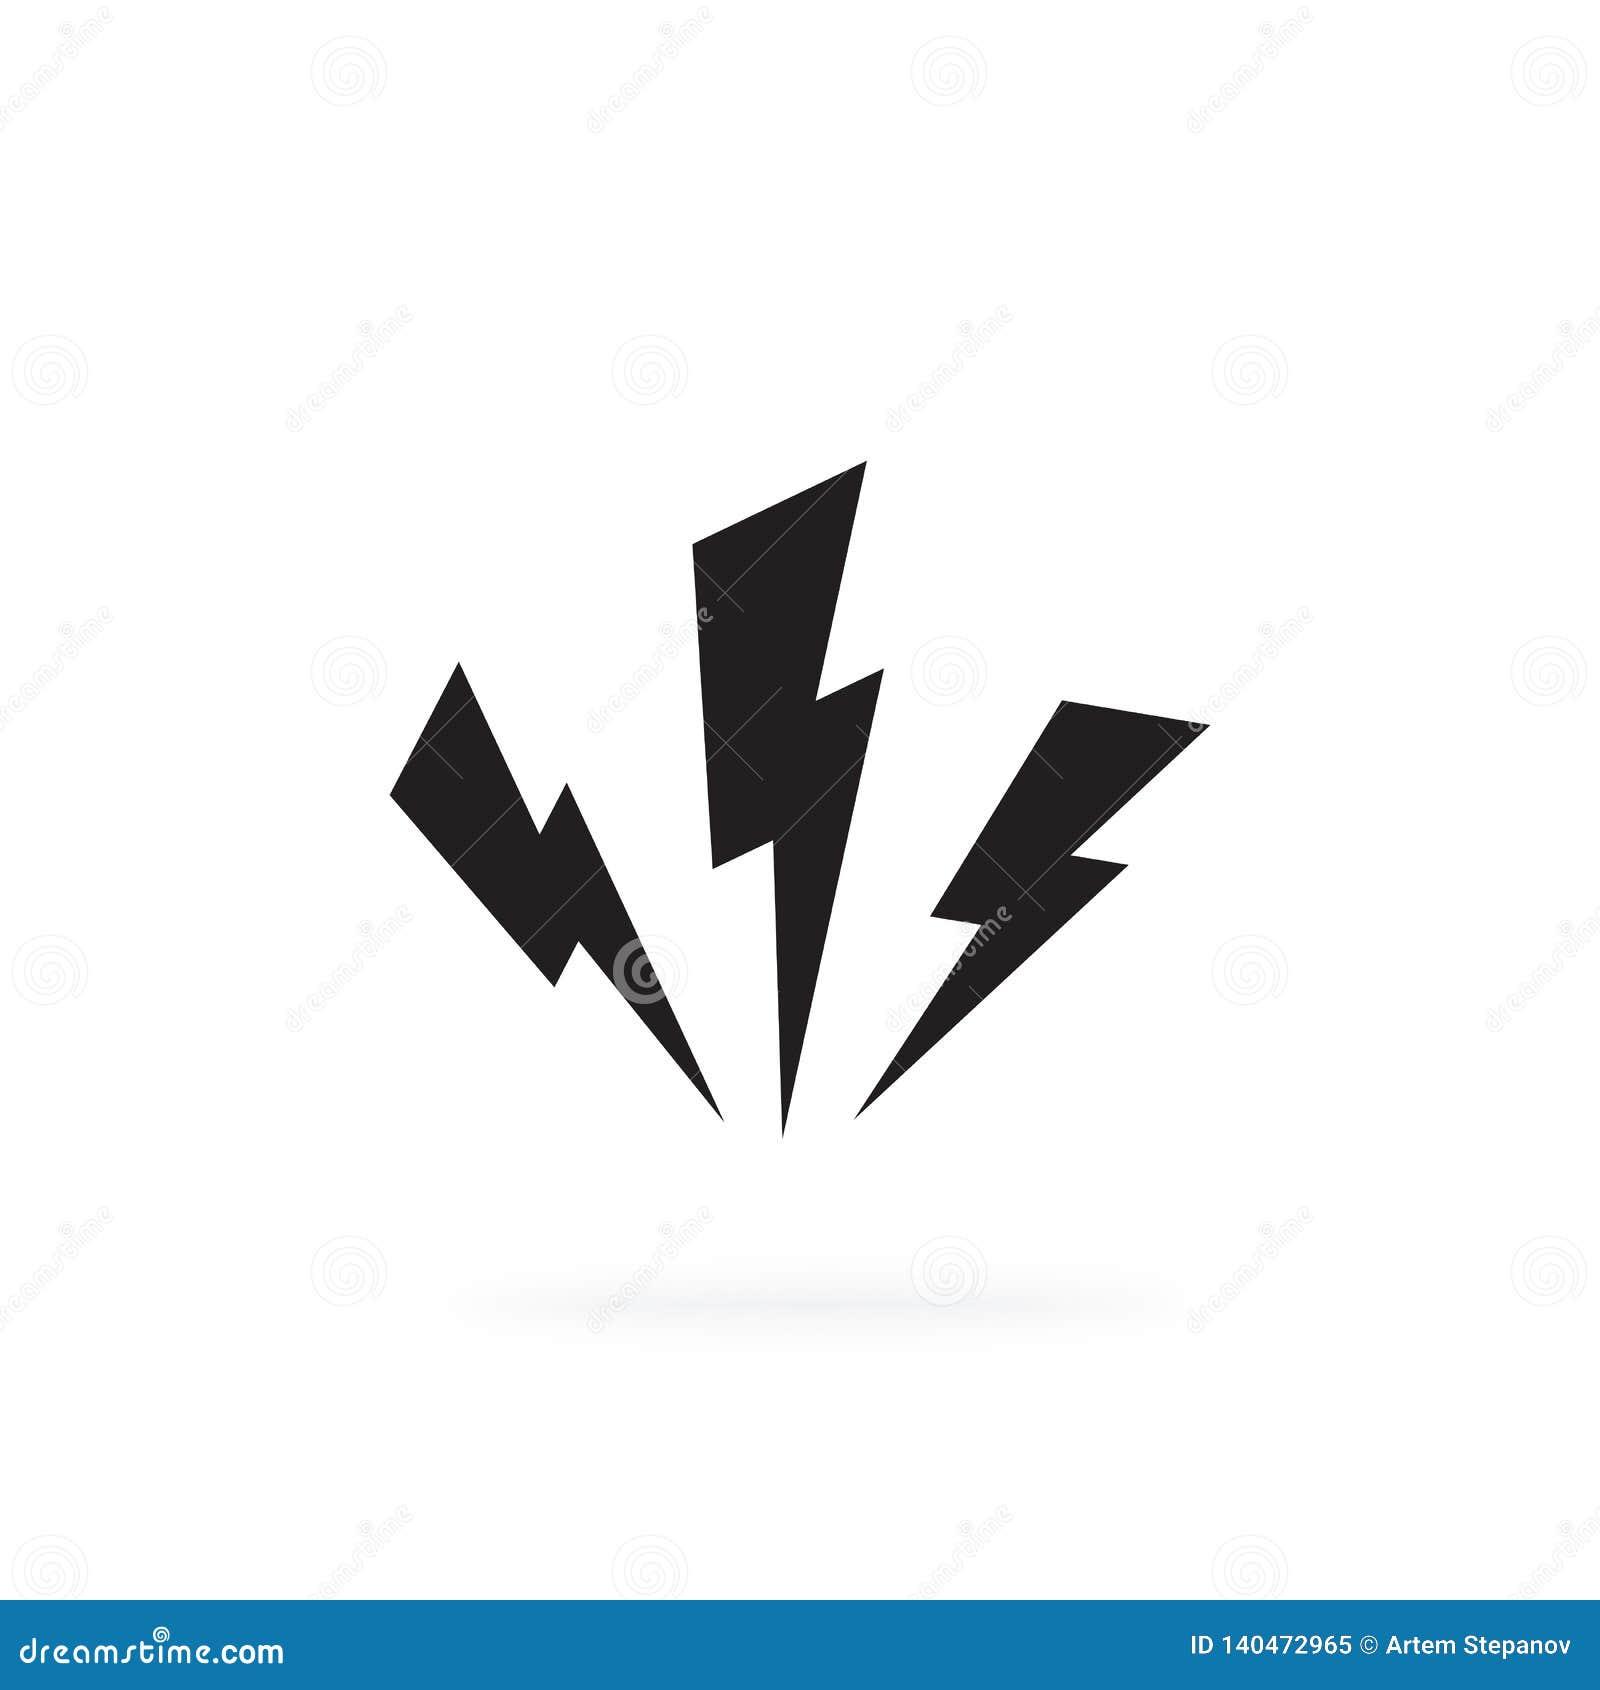 Battery Charger, Lightning Bolt Or Thunderbolt Symbol Stock Vector ...